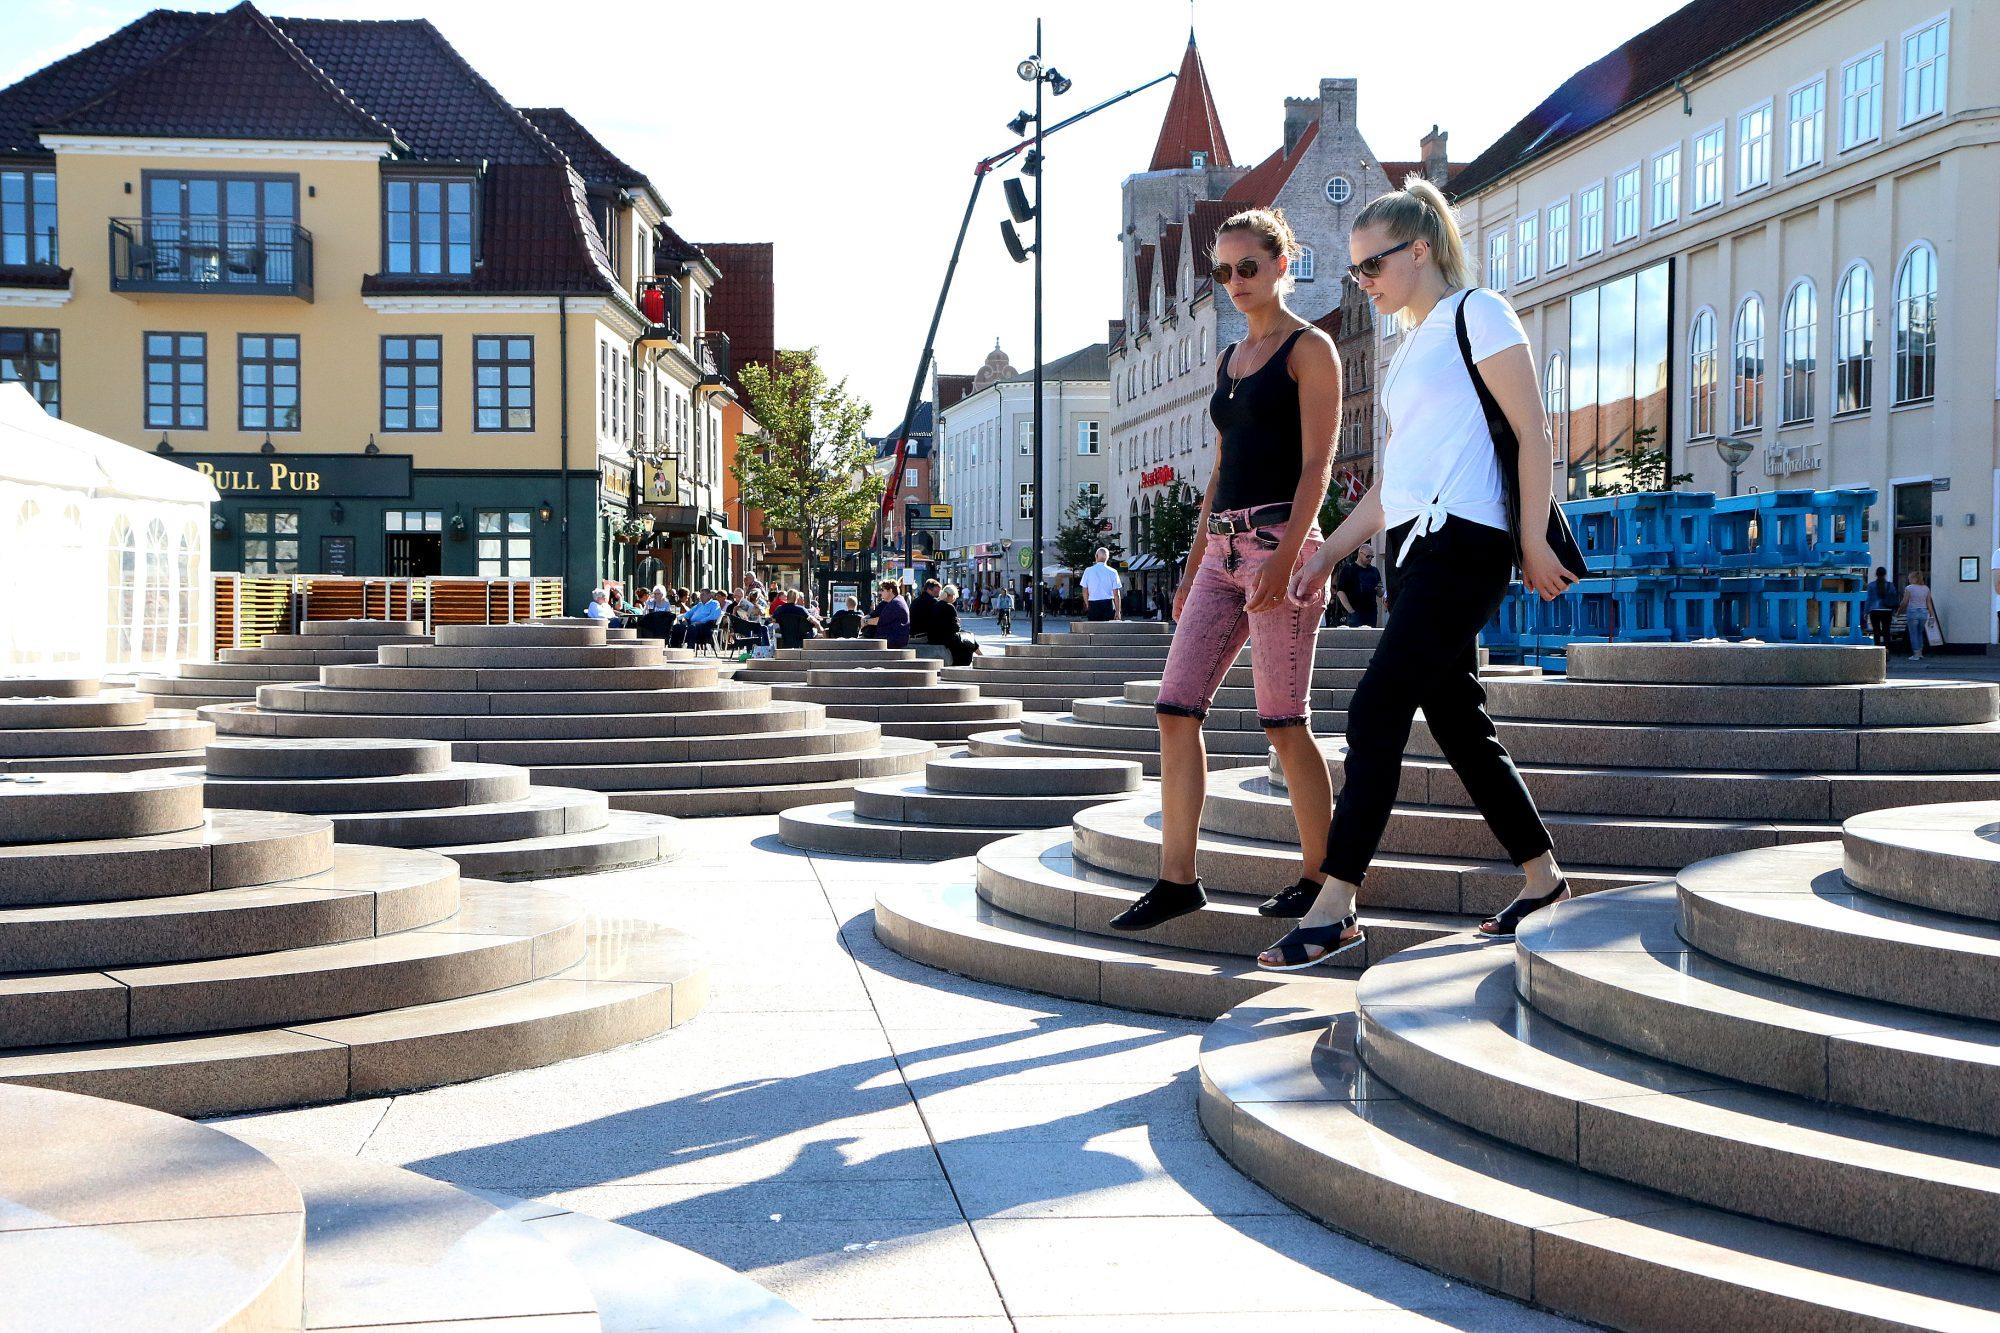 Avslappende storbyliv: Miksen mellom storbyfølelsen og et det koselige og intime, er påtakelig i Danmarks fjerde største by. Foto: Fjord Line